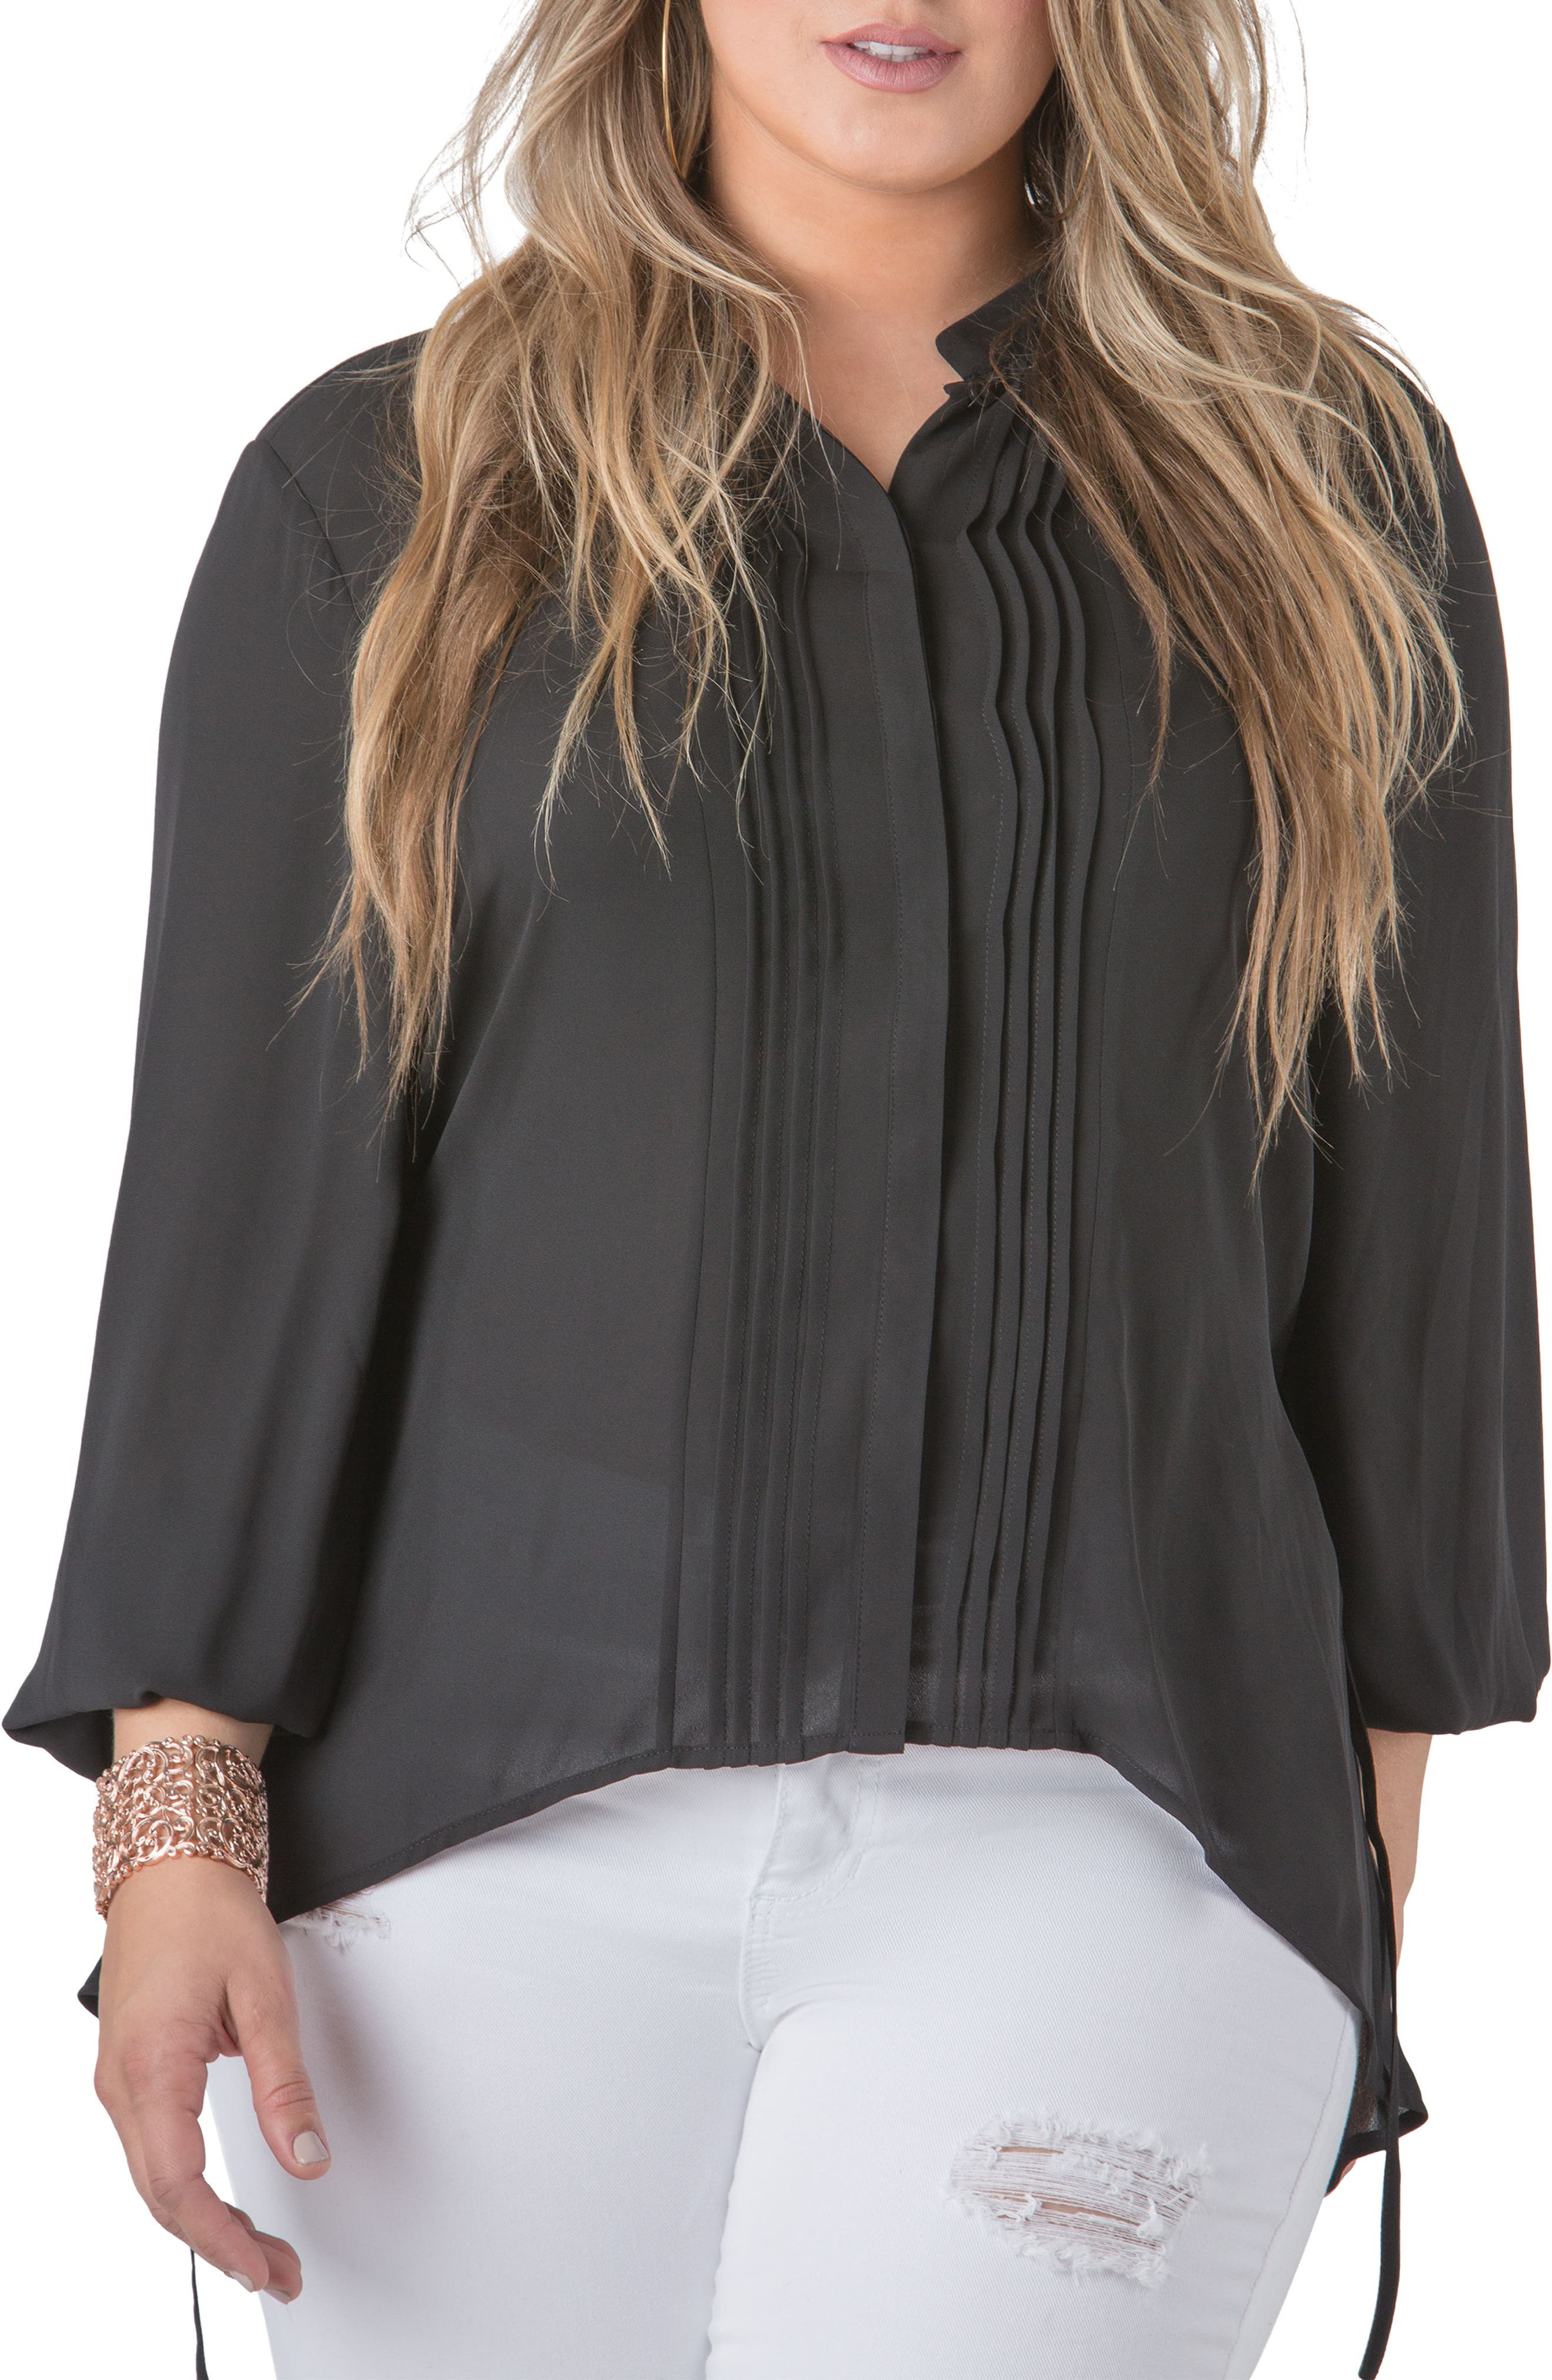 Alternate Image 1 Selected - Standards & Practices Trisha Tuxedo Front Chiffon Blouse